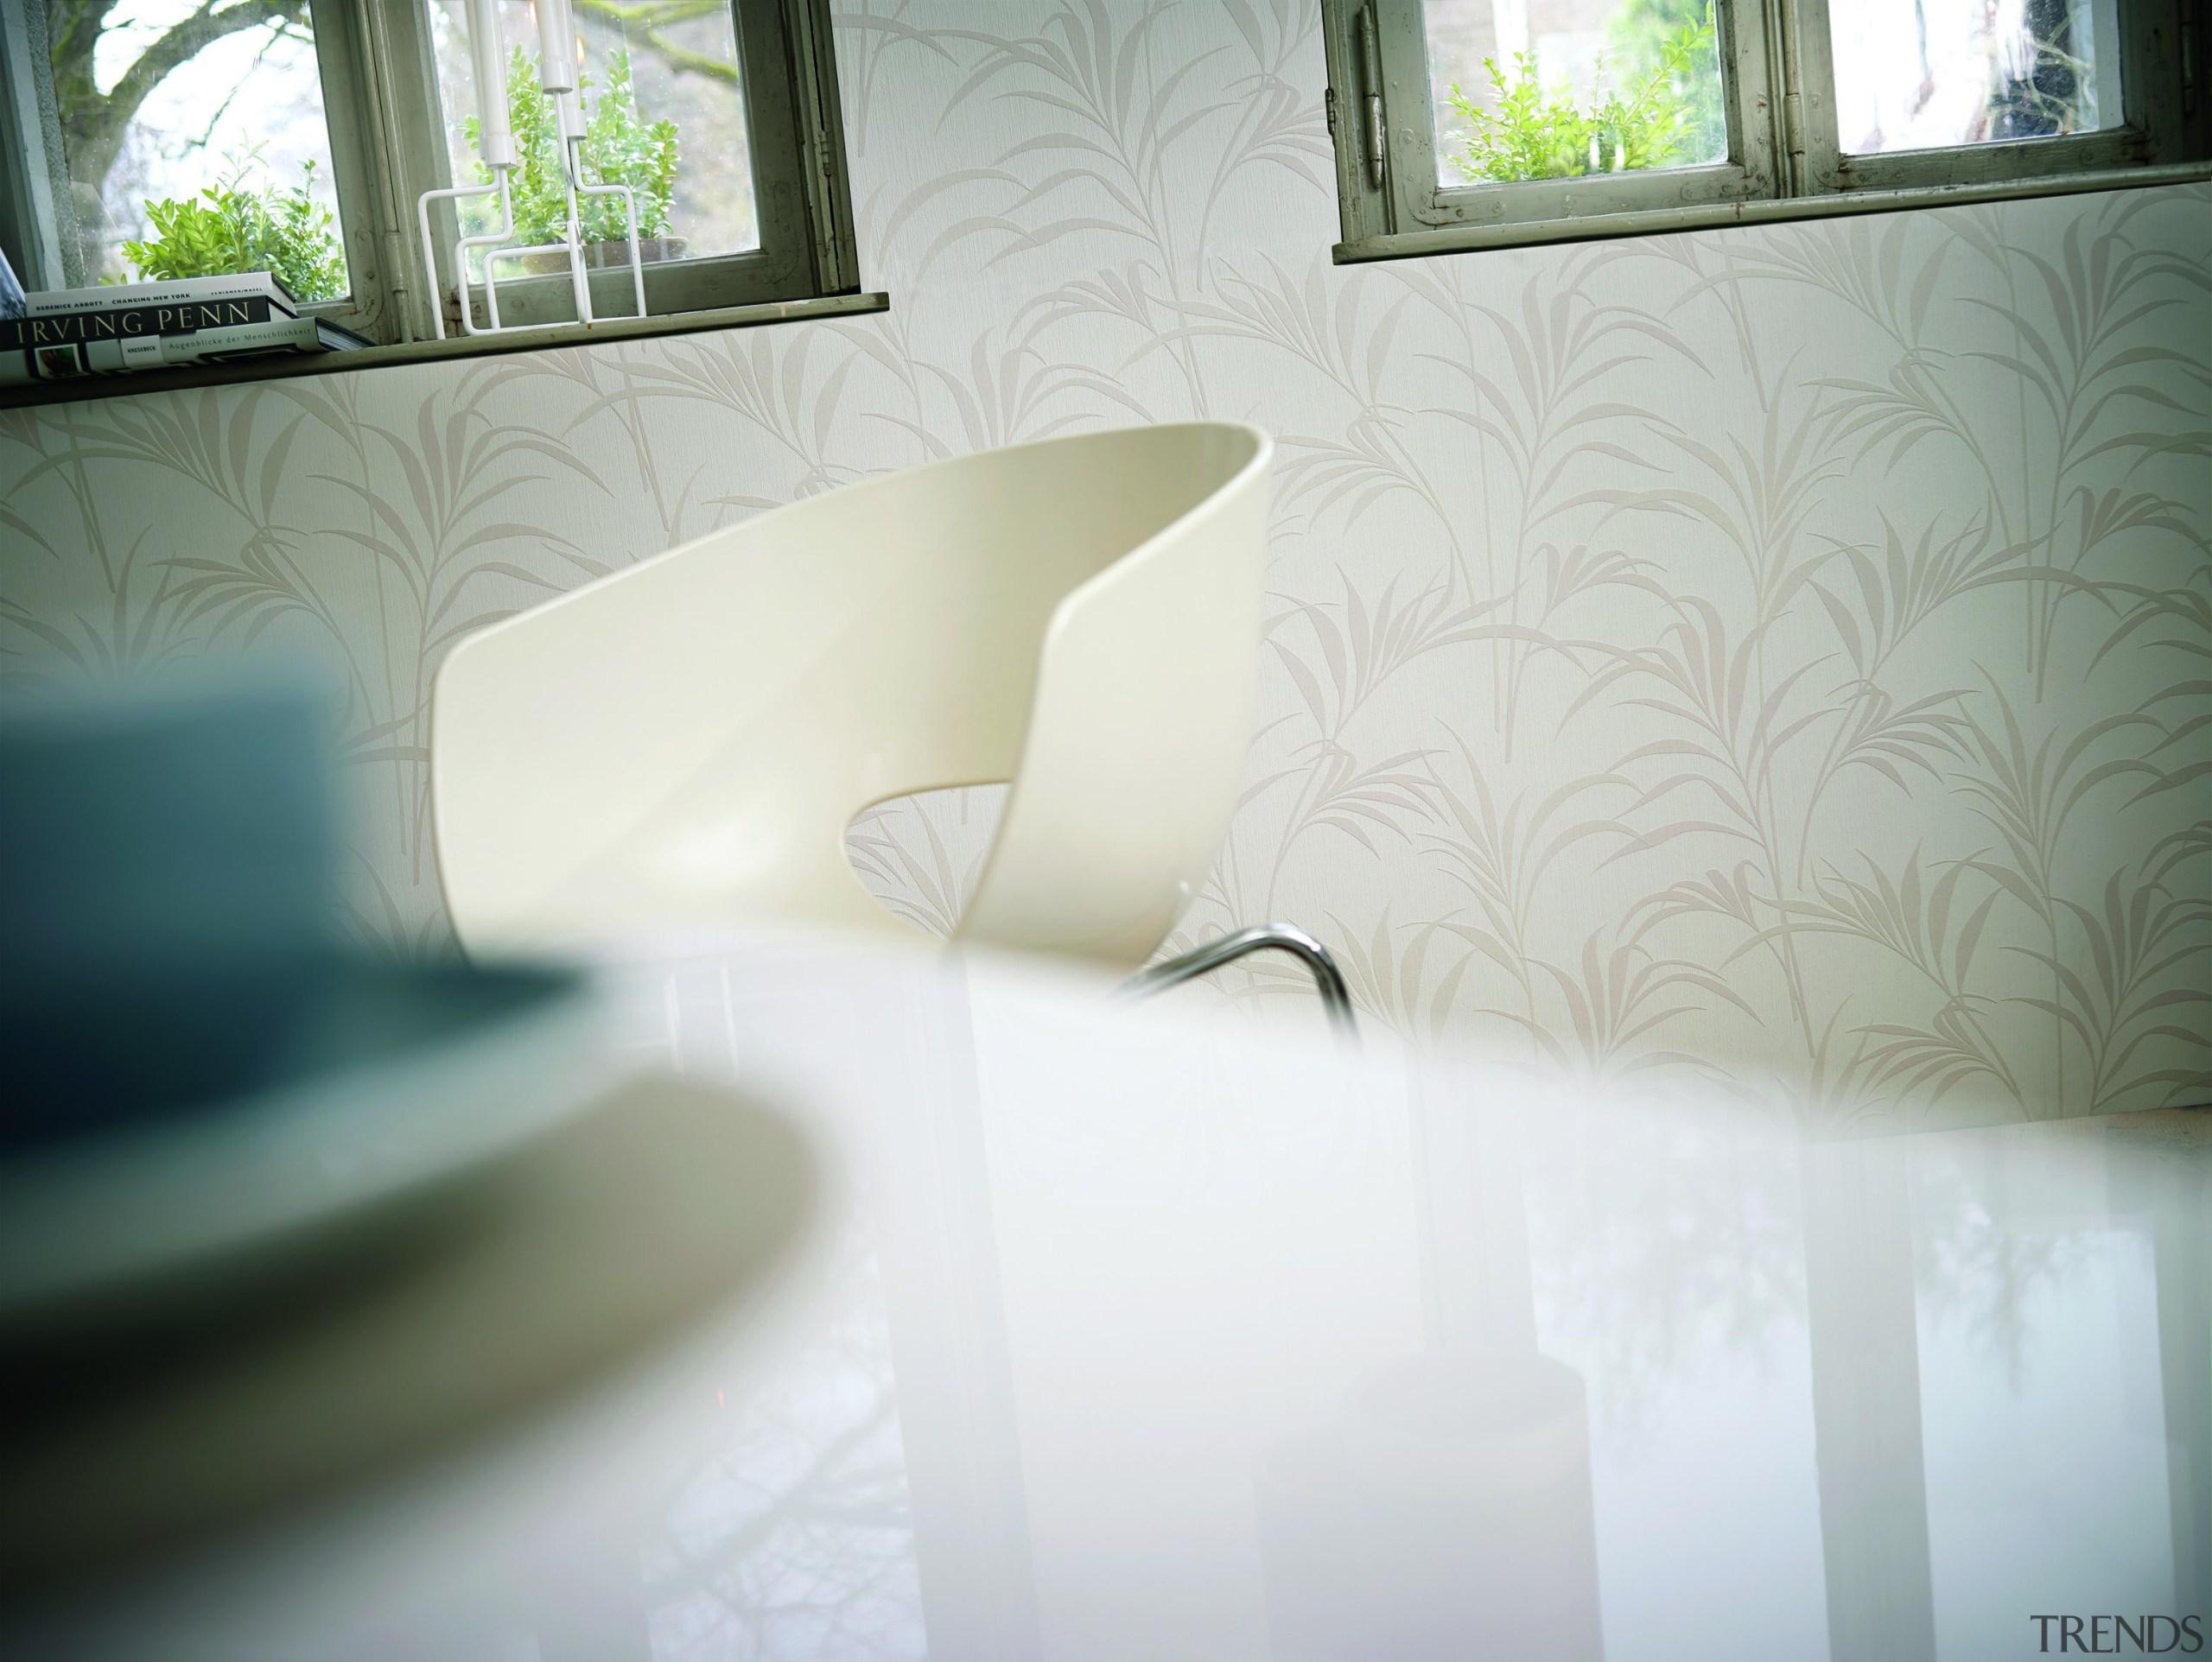 Elegance II Range - Elegance II Range - architecture, ceiling, couch, daylighting, design, floor, furniture, home, interior design, living room, product design, room, table, wall, window, white, gray